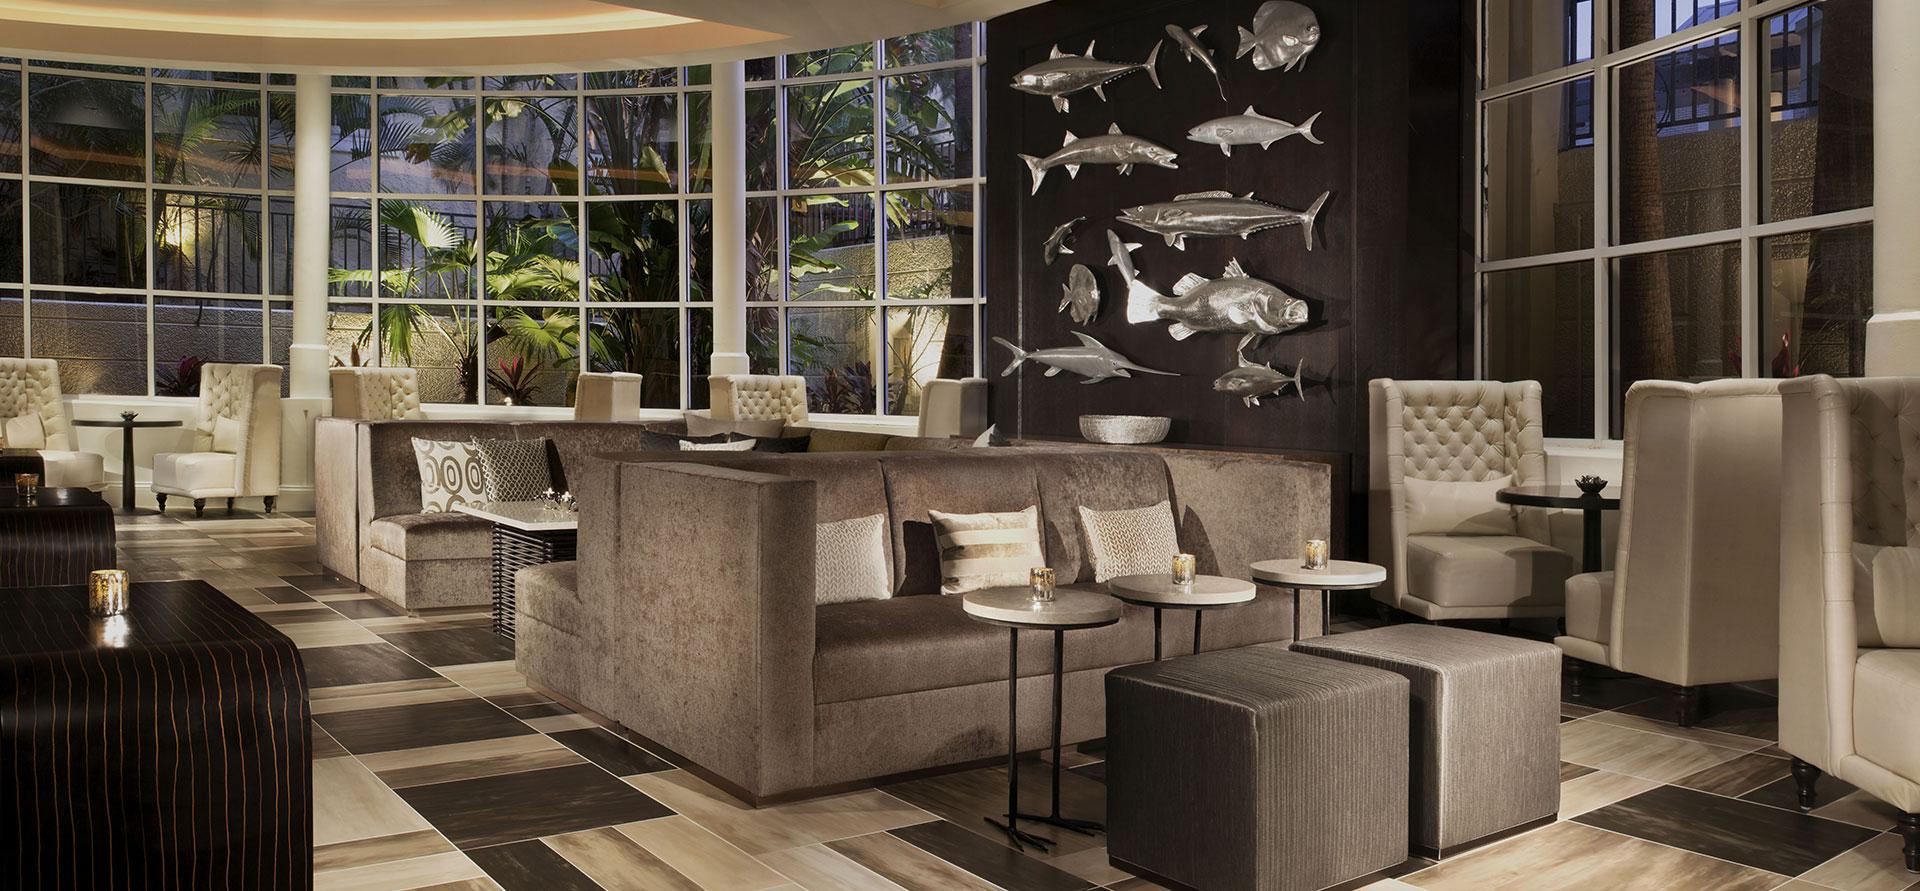 Dining Facilities at La Concha Hotel & Spa, Key West